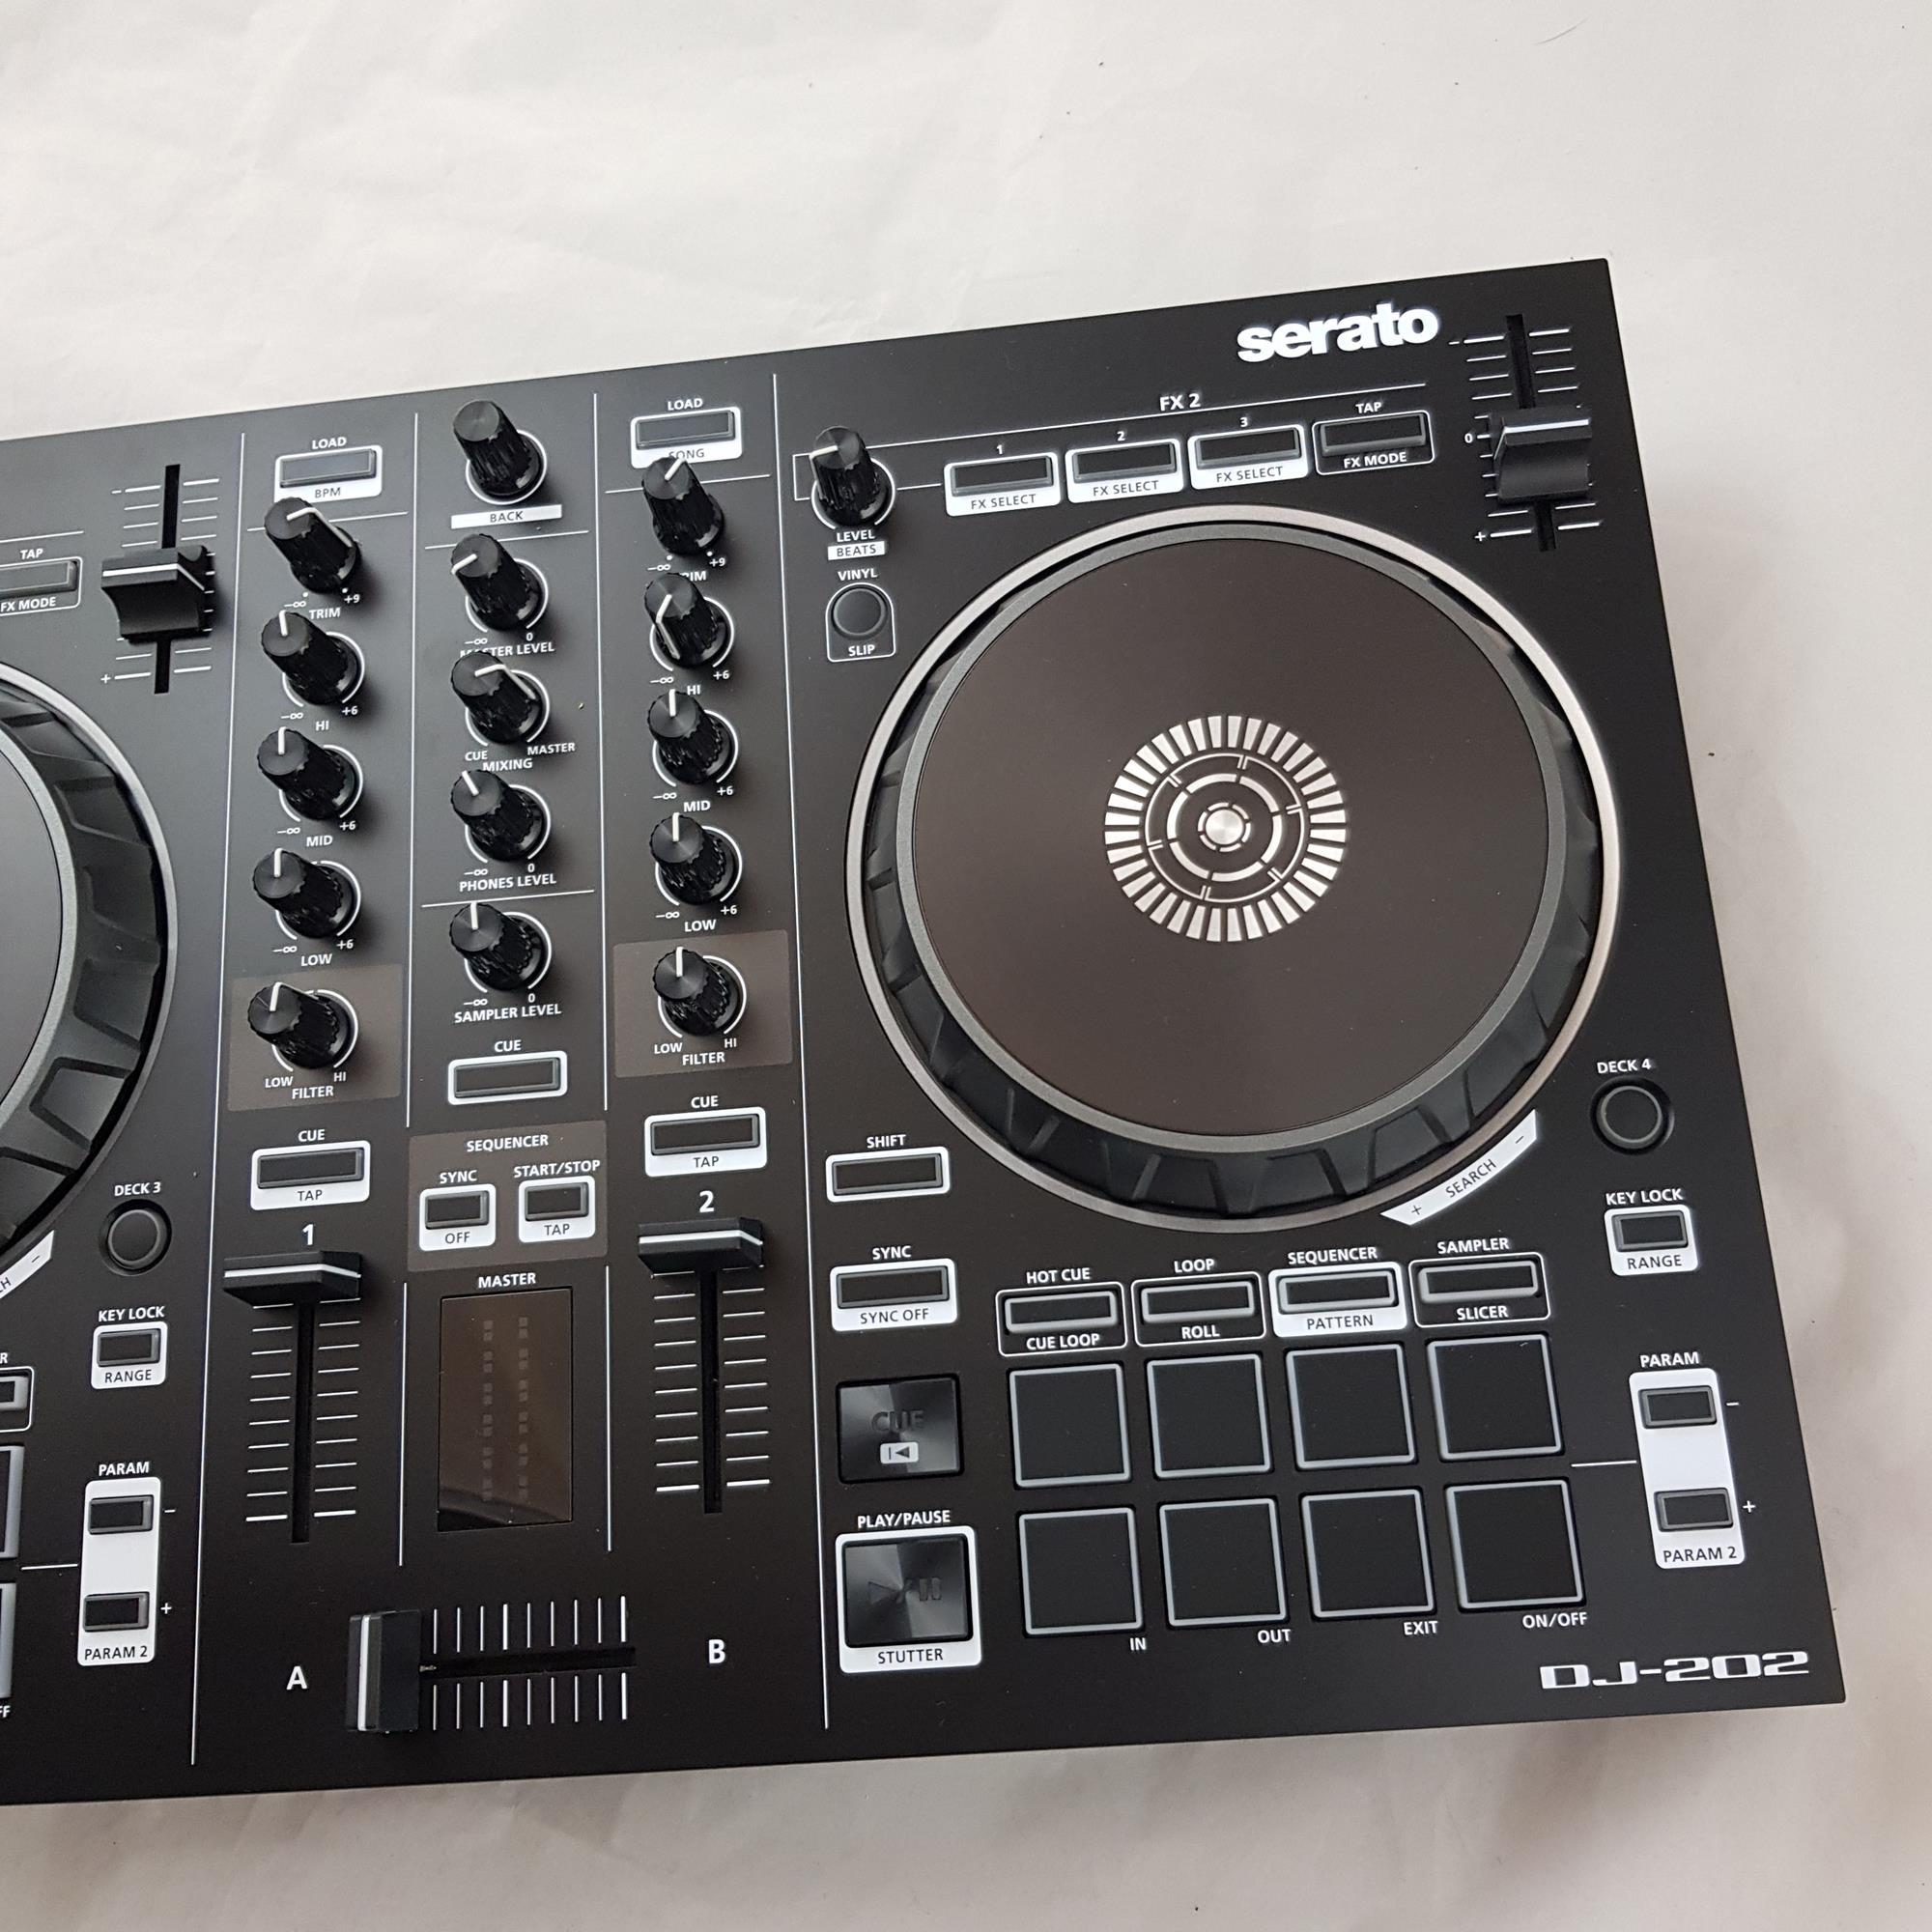 ROLAND DJ-202 SERATO CONTROLLER